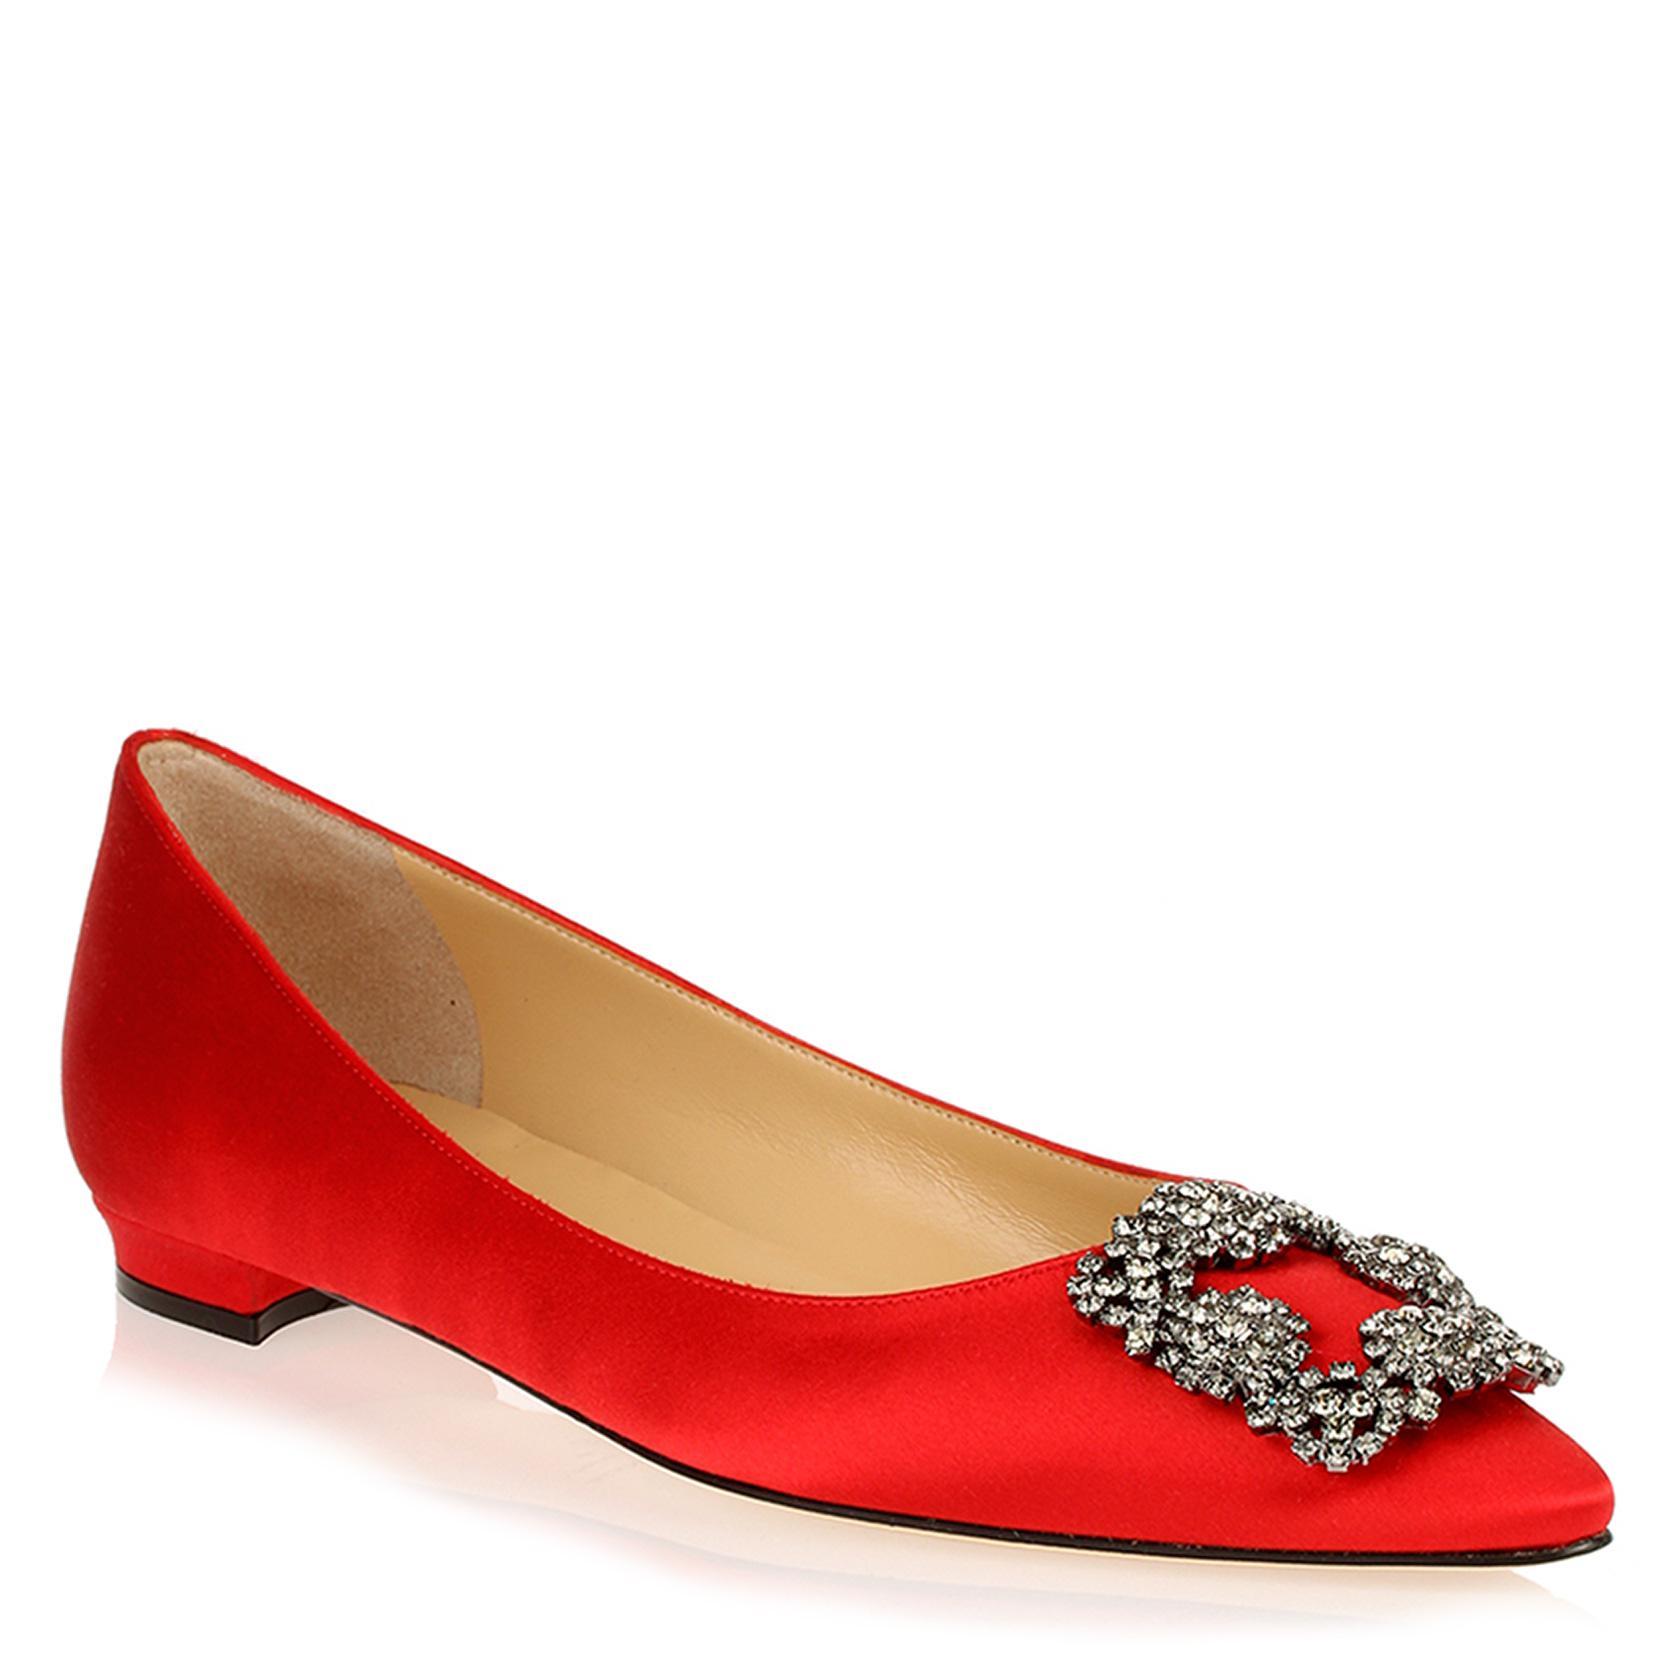 Hangisi Chaussures De Ballerine - Rouge Blahnik Manolo 7v6xLWWvDS